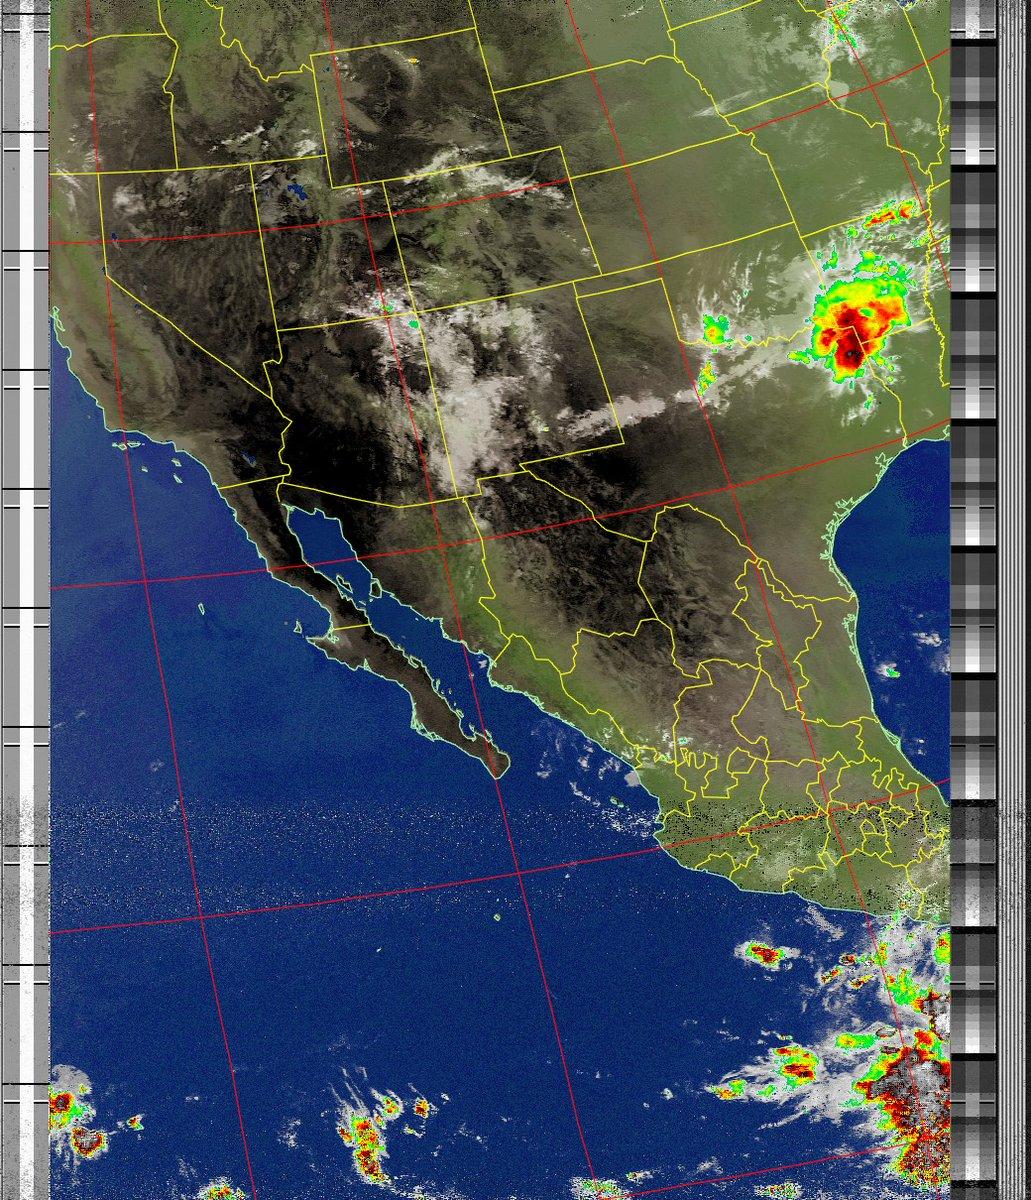 Satellite Image: NOAA 18 05-08-2020 11:47. Max Elevation: 41 Degrees. #NOAA #weather #TXlisteningpostimages #noaasatellite #RTLSDR #raspberrypipic.twitter.com/fevP2kCZFG